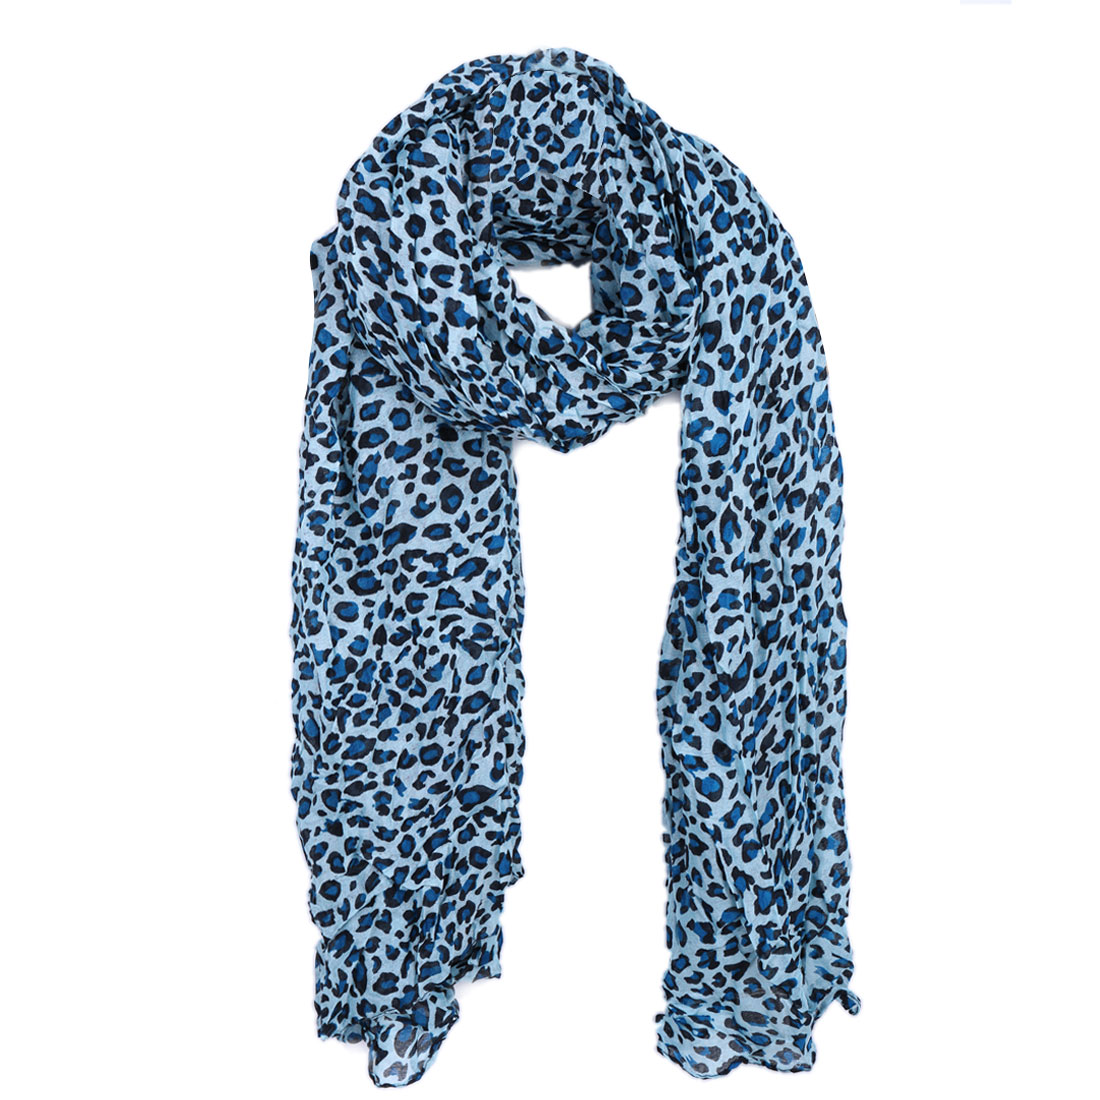 Women Pleated Fashionable Stylish Scarf Light Blue Black